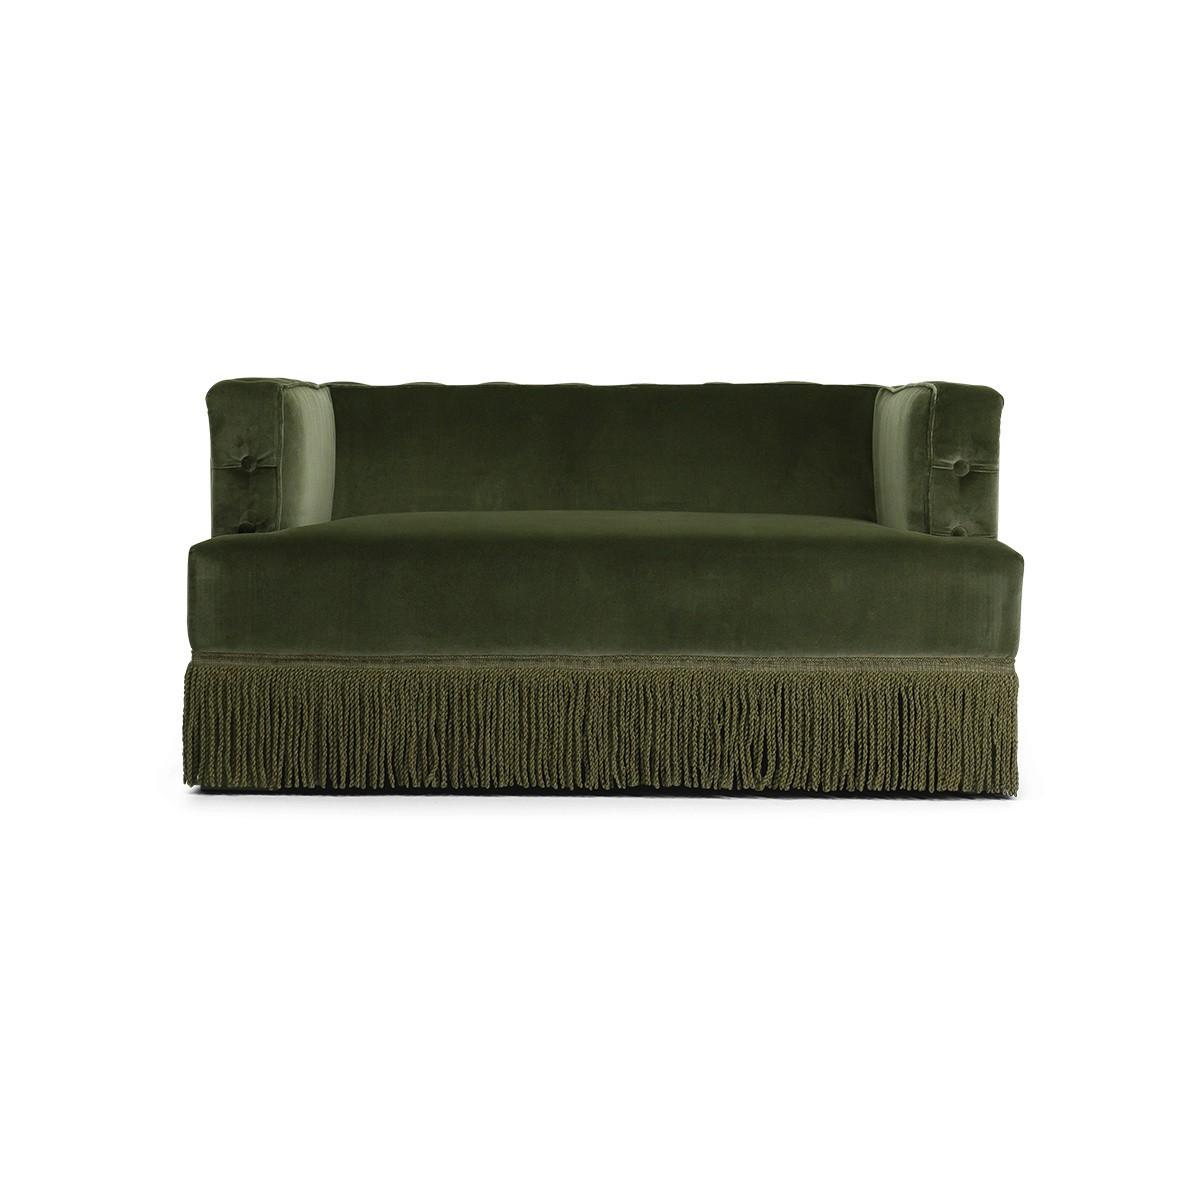 Nonna Sofa, Fir Green Velvet